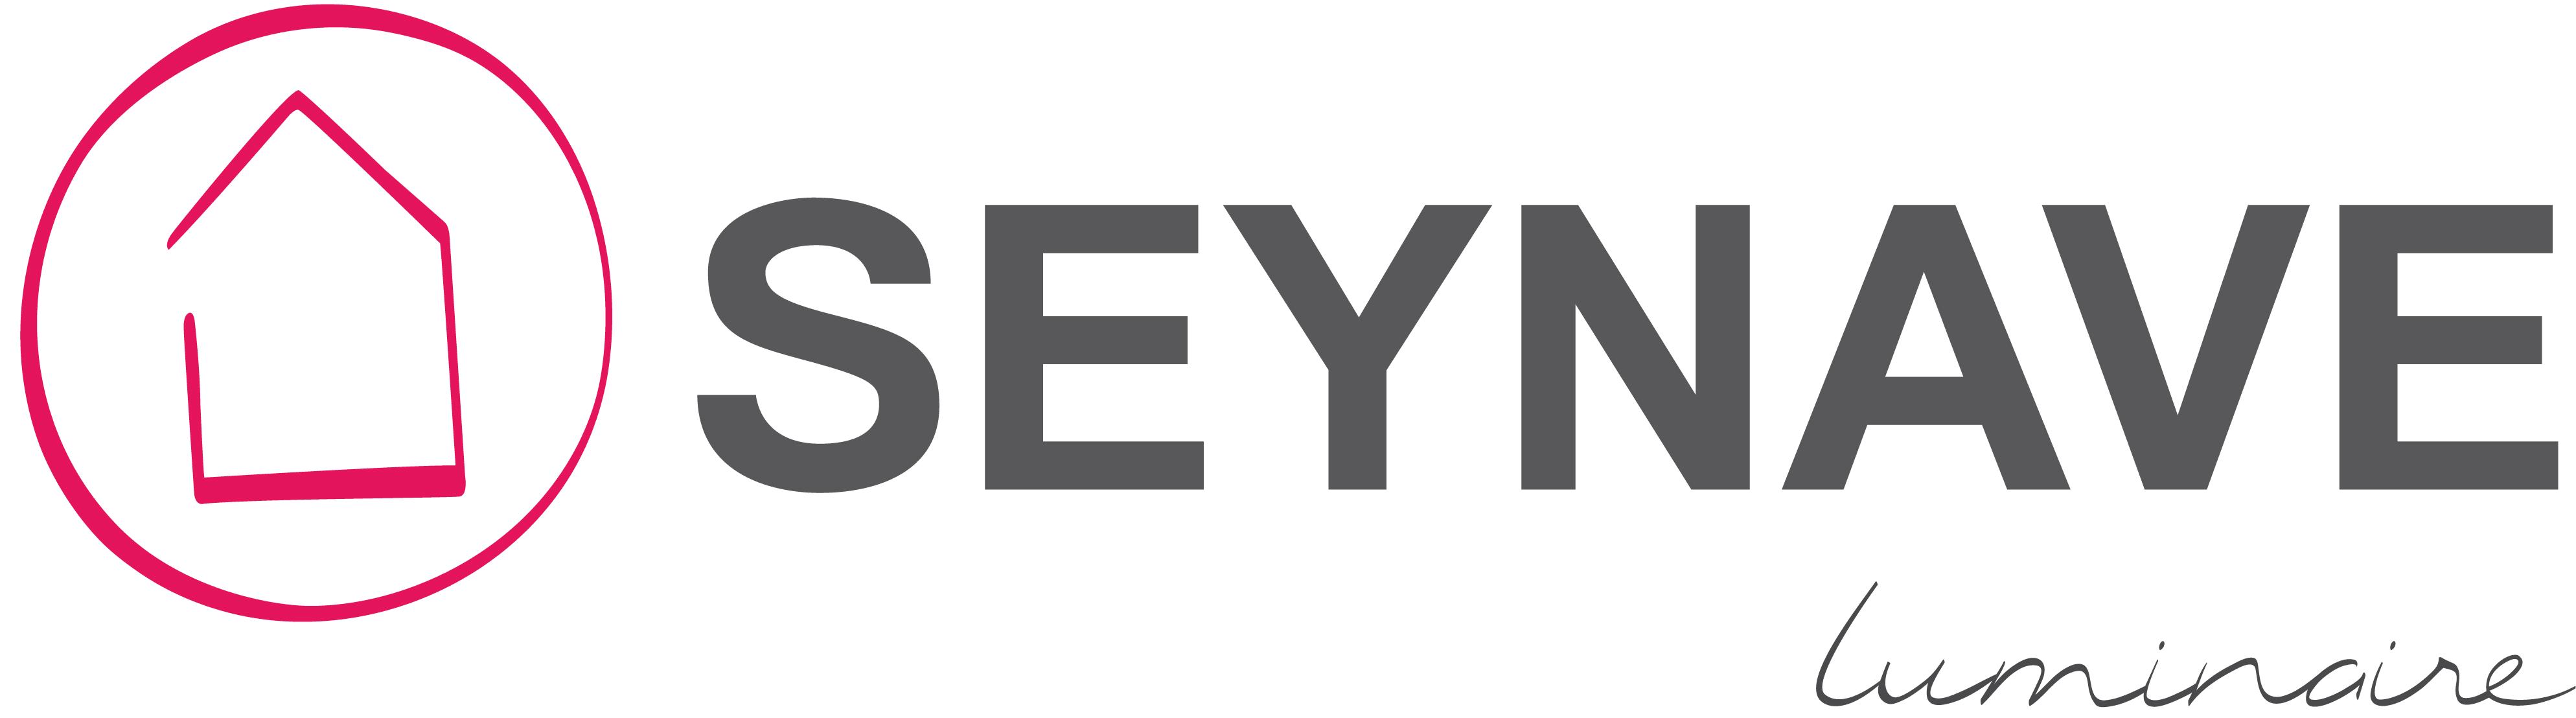 MC_Seynave